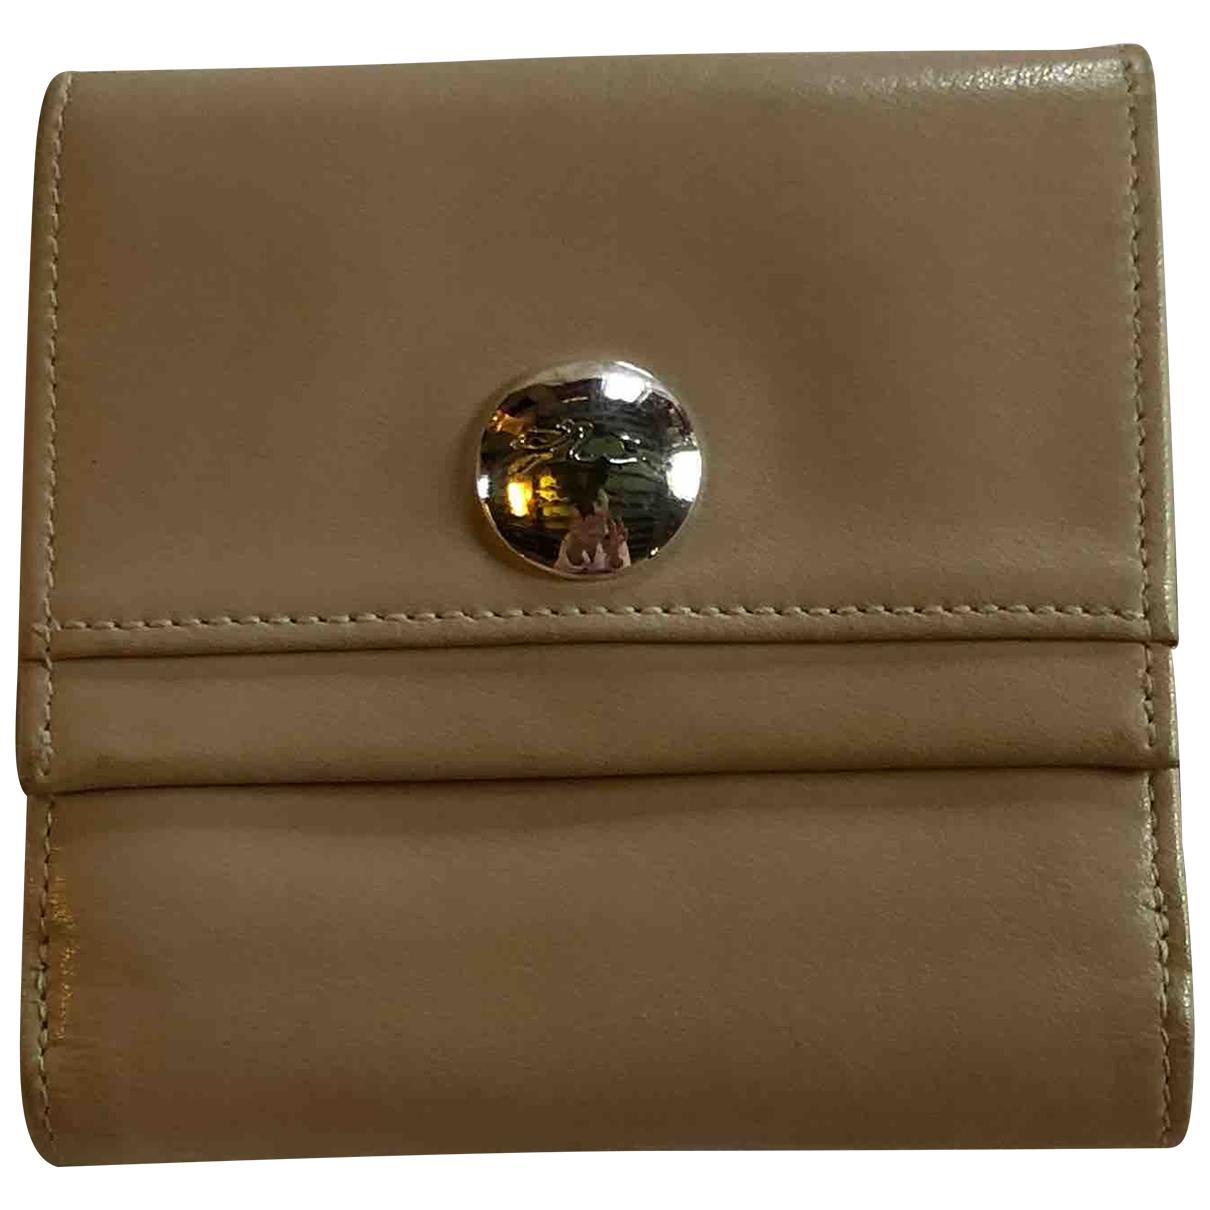 Longchamp \N Kleinlederwaren in  Beige Leder